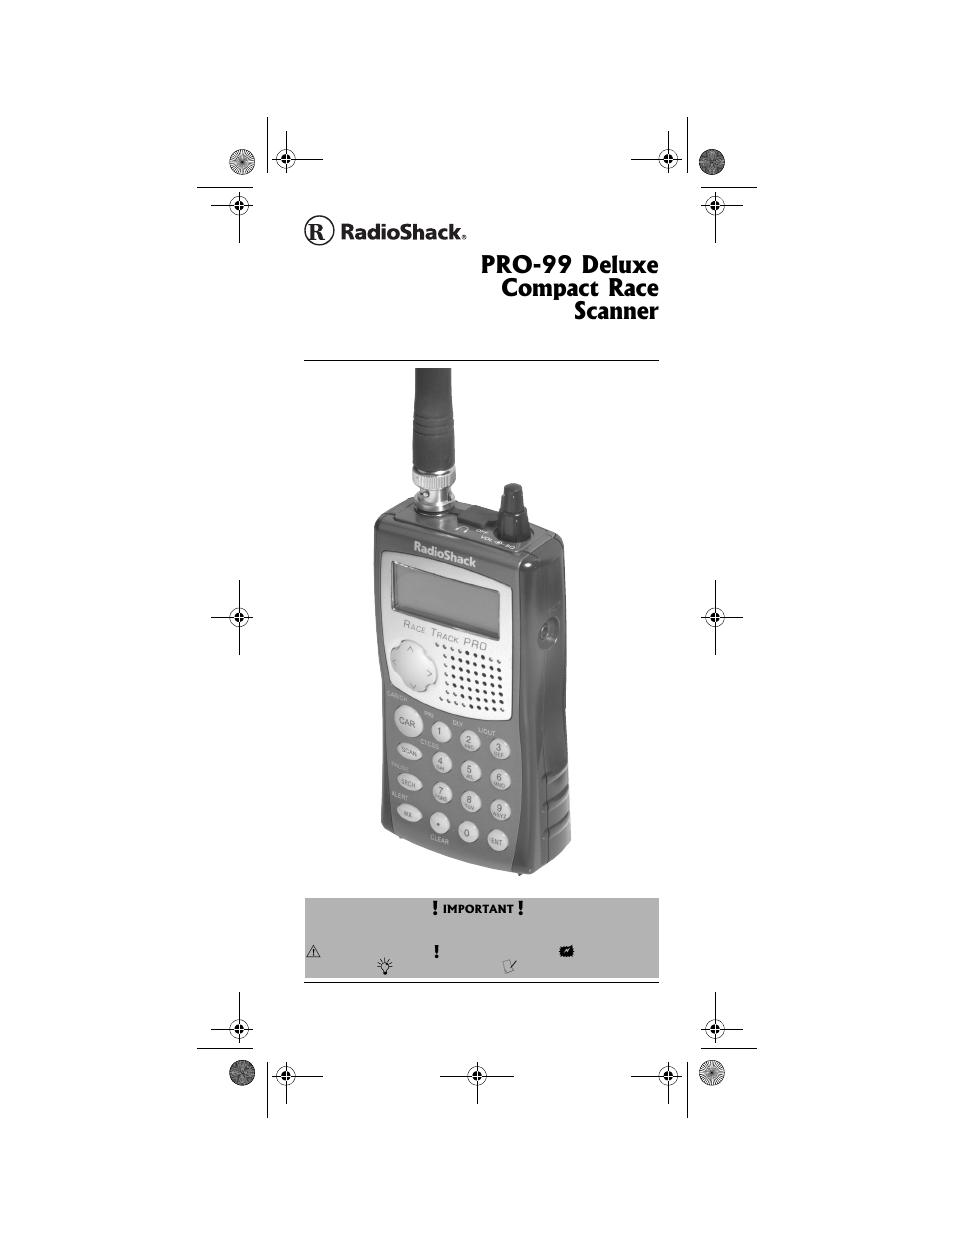 radio shack pro 76 manual how to and user guide instructions u2022 rh taxibermuda co radio shack pro 91 manual free download Radio Shack Scanners